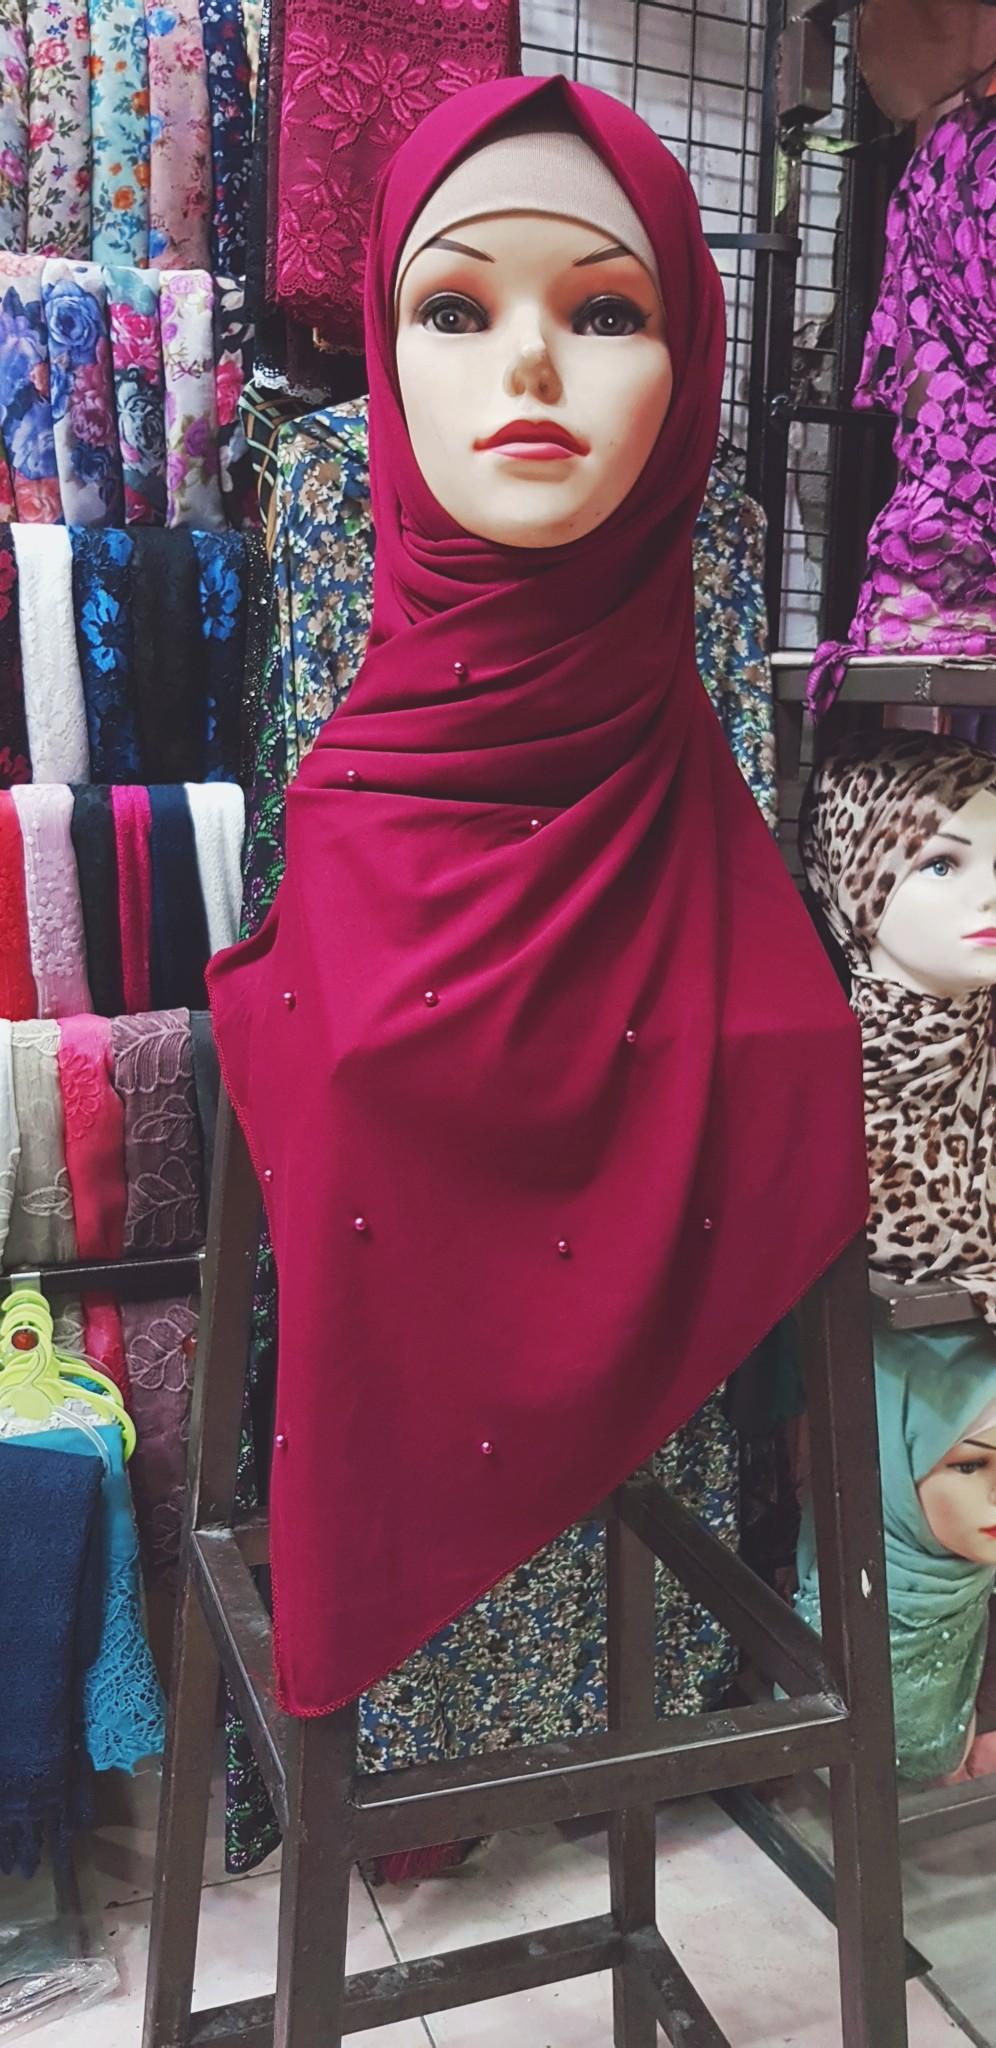 ملابس واحذية ماركات 😍-  شروه شالات ستاندر بسعر...